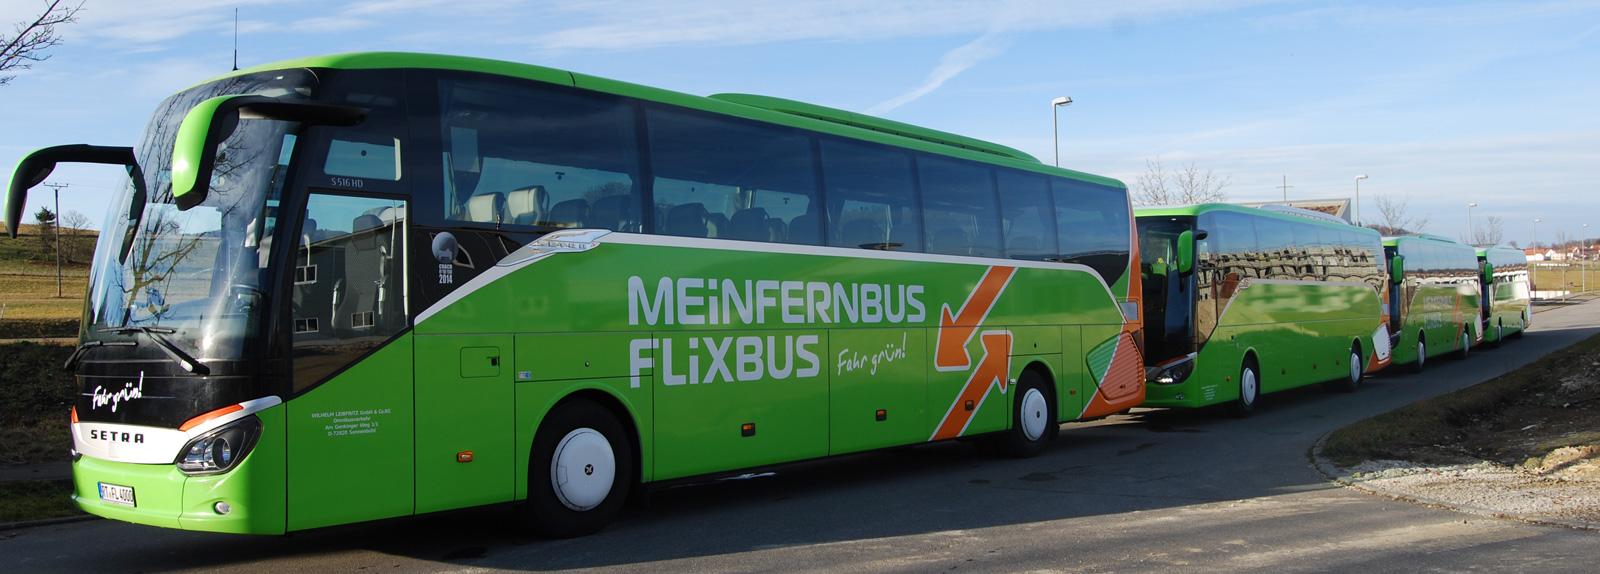 flixbus reisen reisebus reiseveranstalter reutlingen. Black Bedroom Furniture Sets. Home Design Ideas